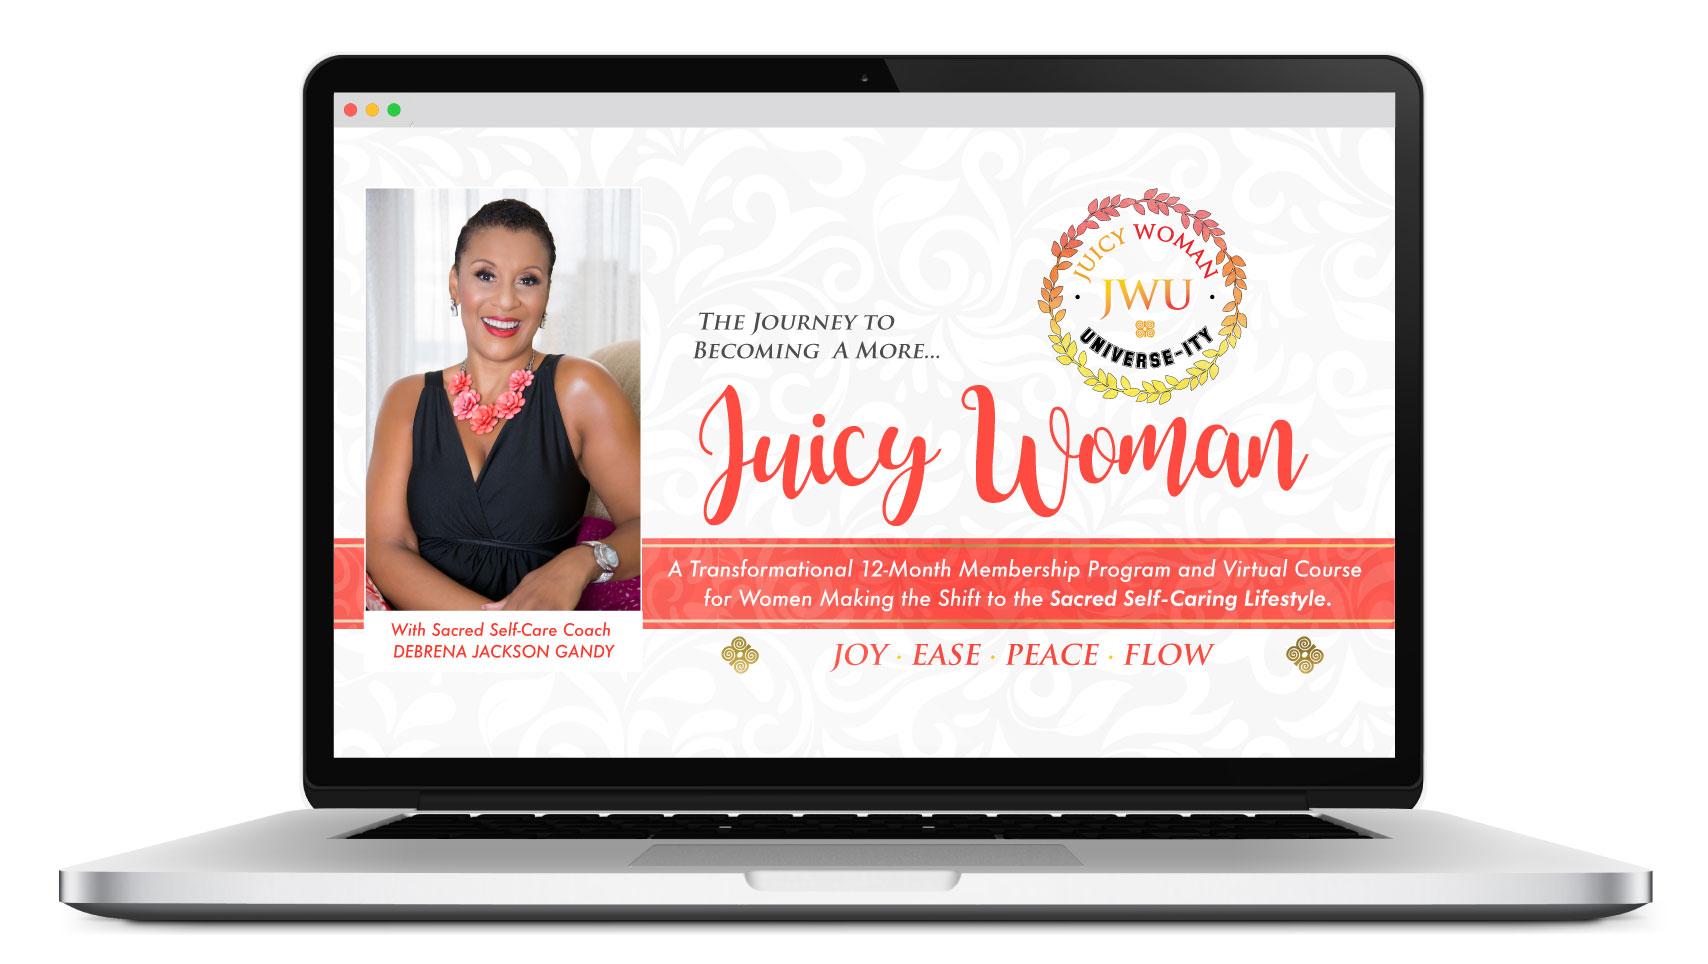 Juicy Woman University